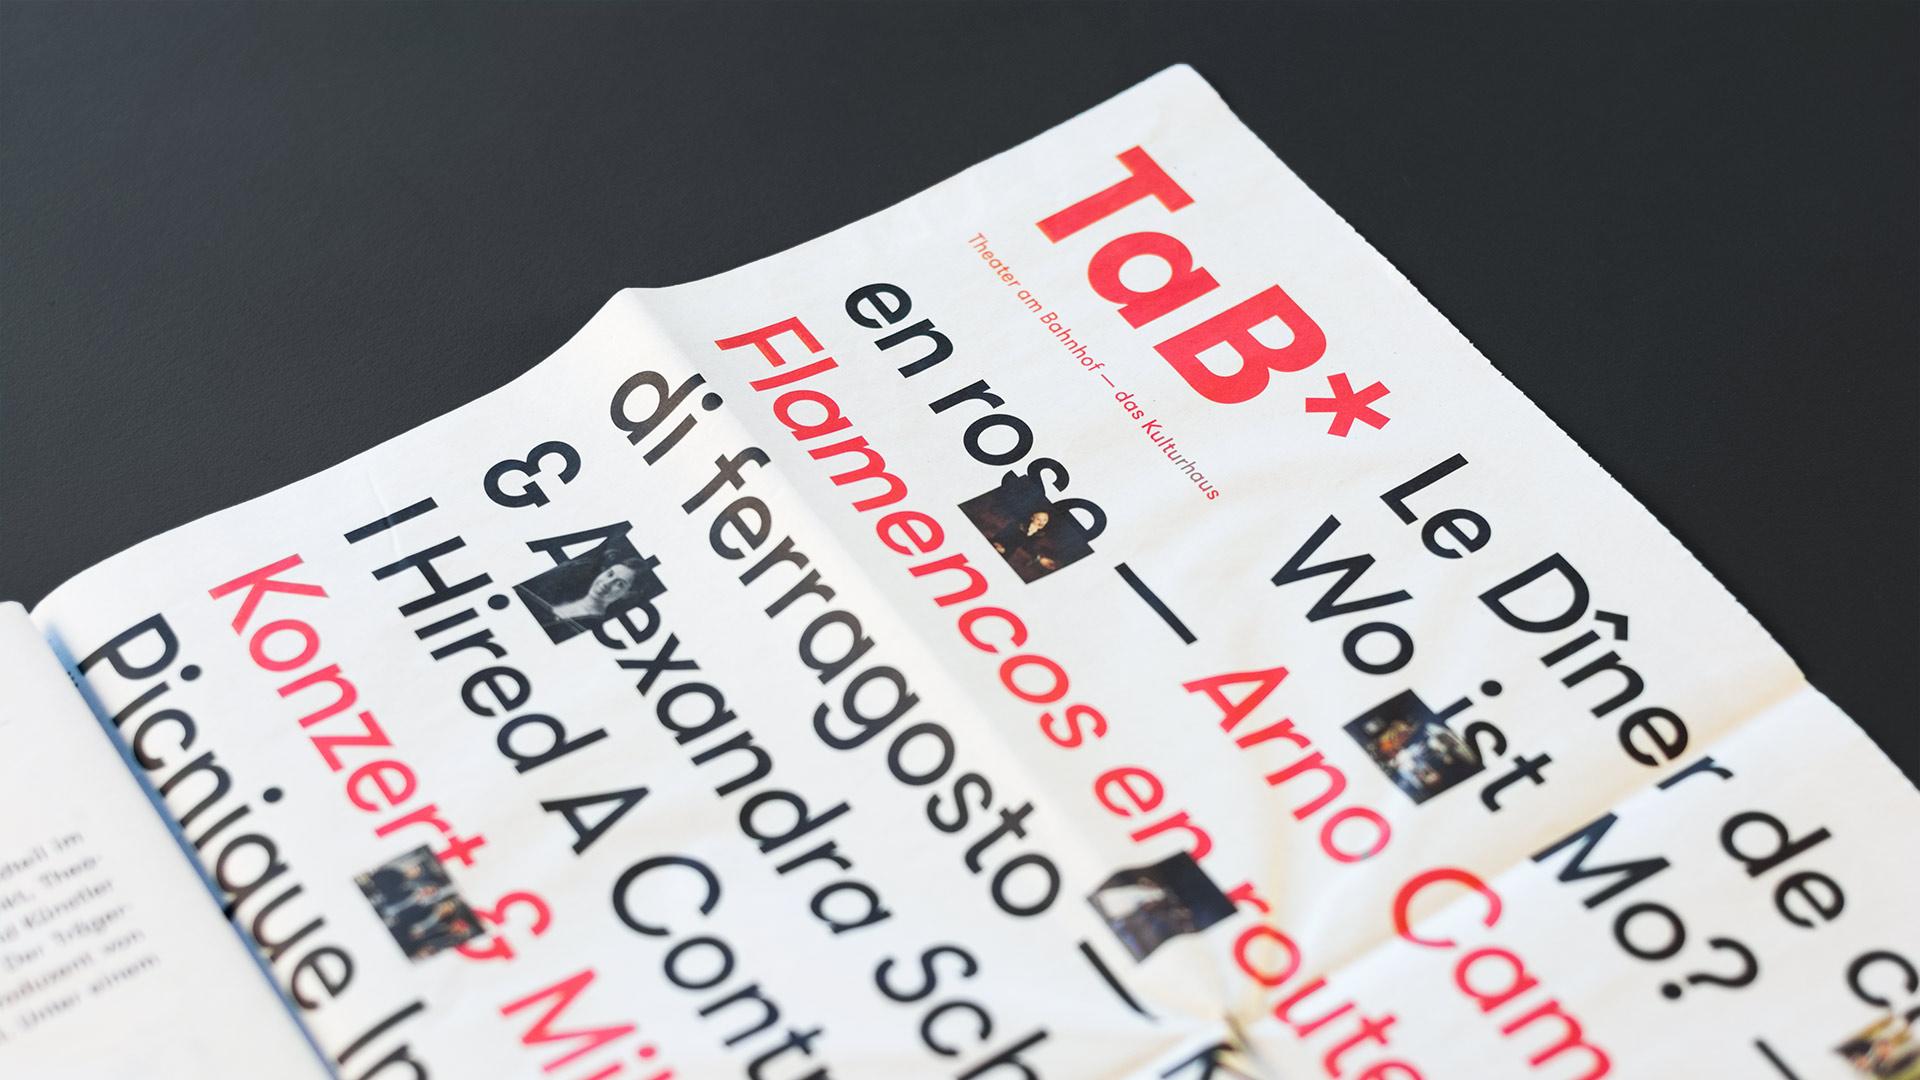 l'équipe [visuelle] – TaB* Theater am Bahnhof – Programmzeitung, Corporate Design, Plakate, Flyer, Kultur